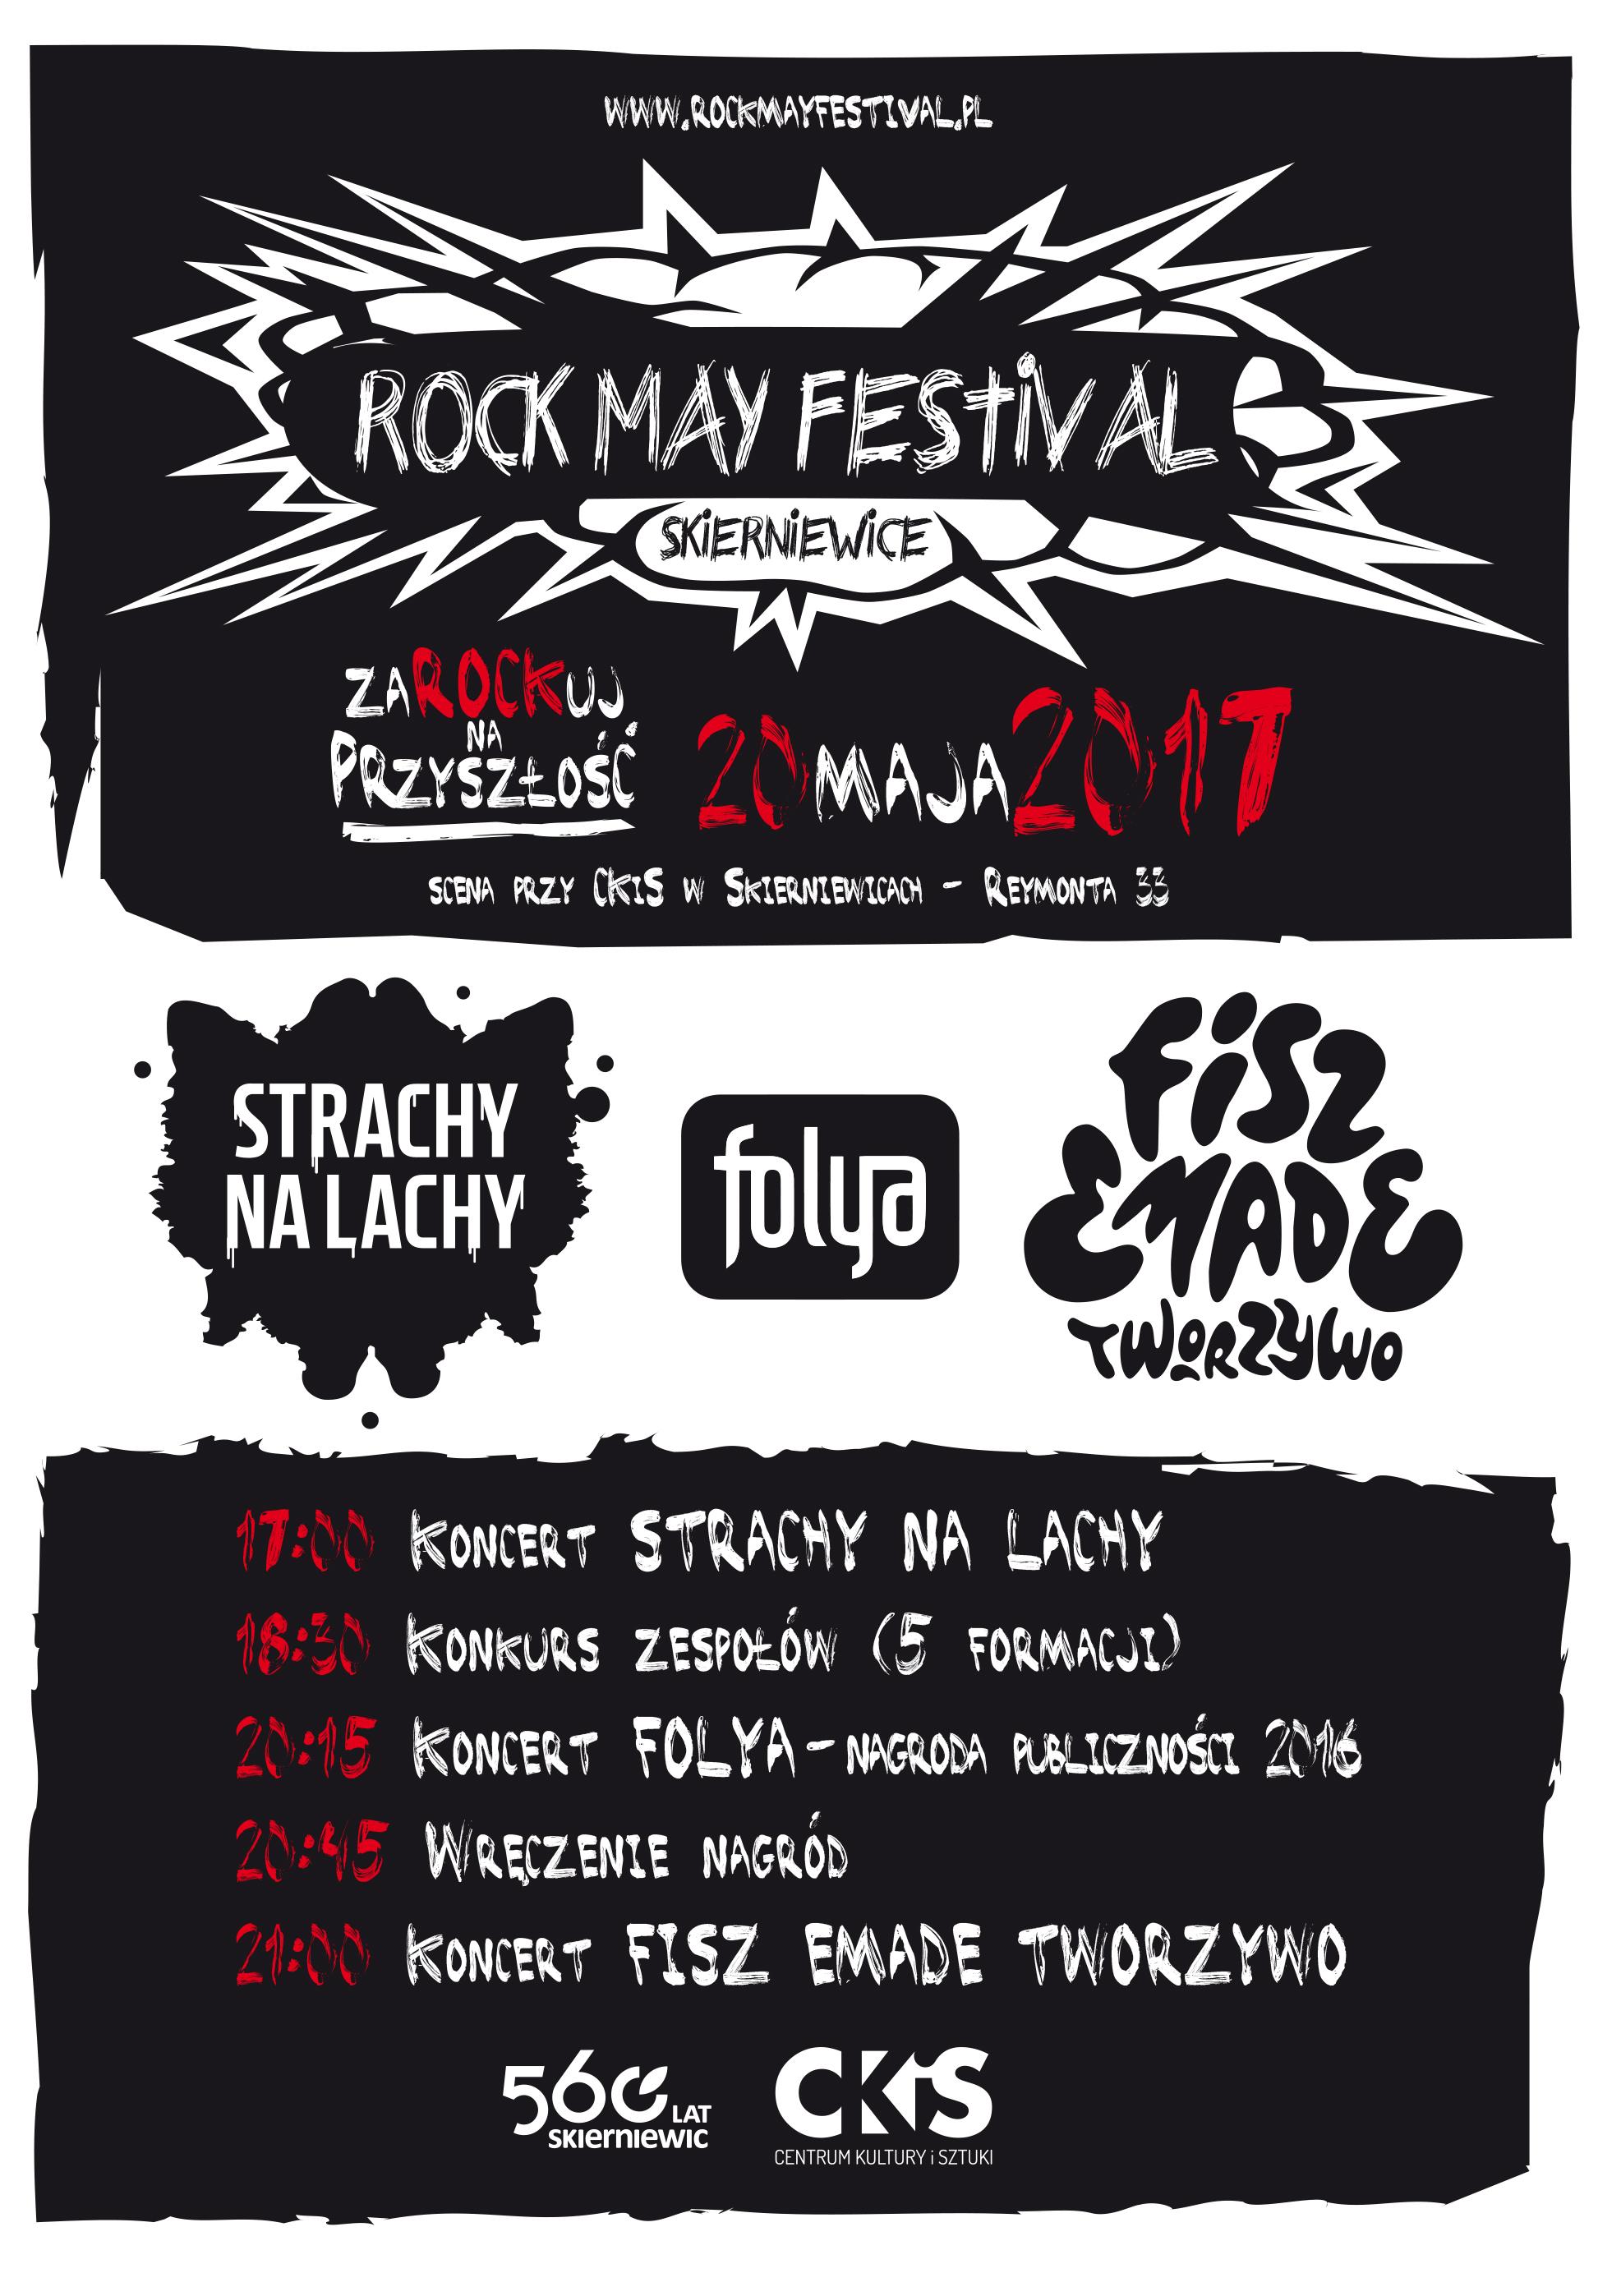 Zagraj na XVI  edycji festiwalu Rock May Festival